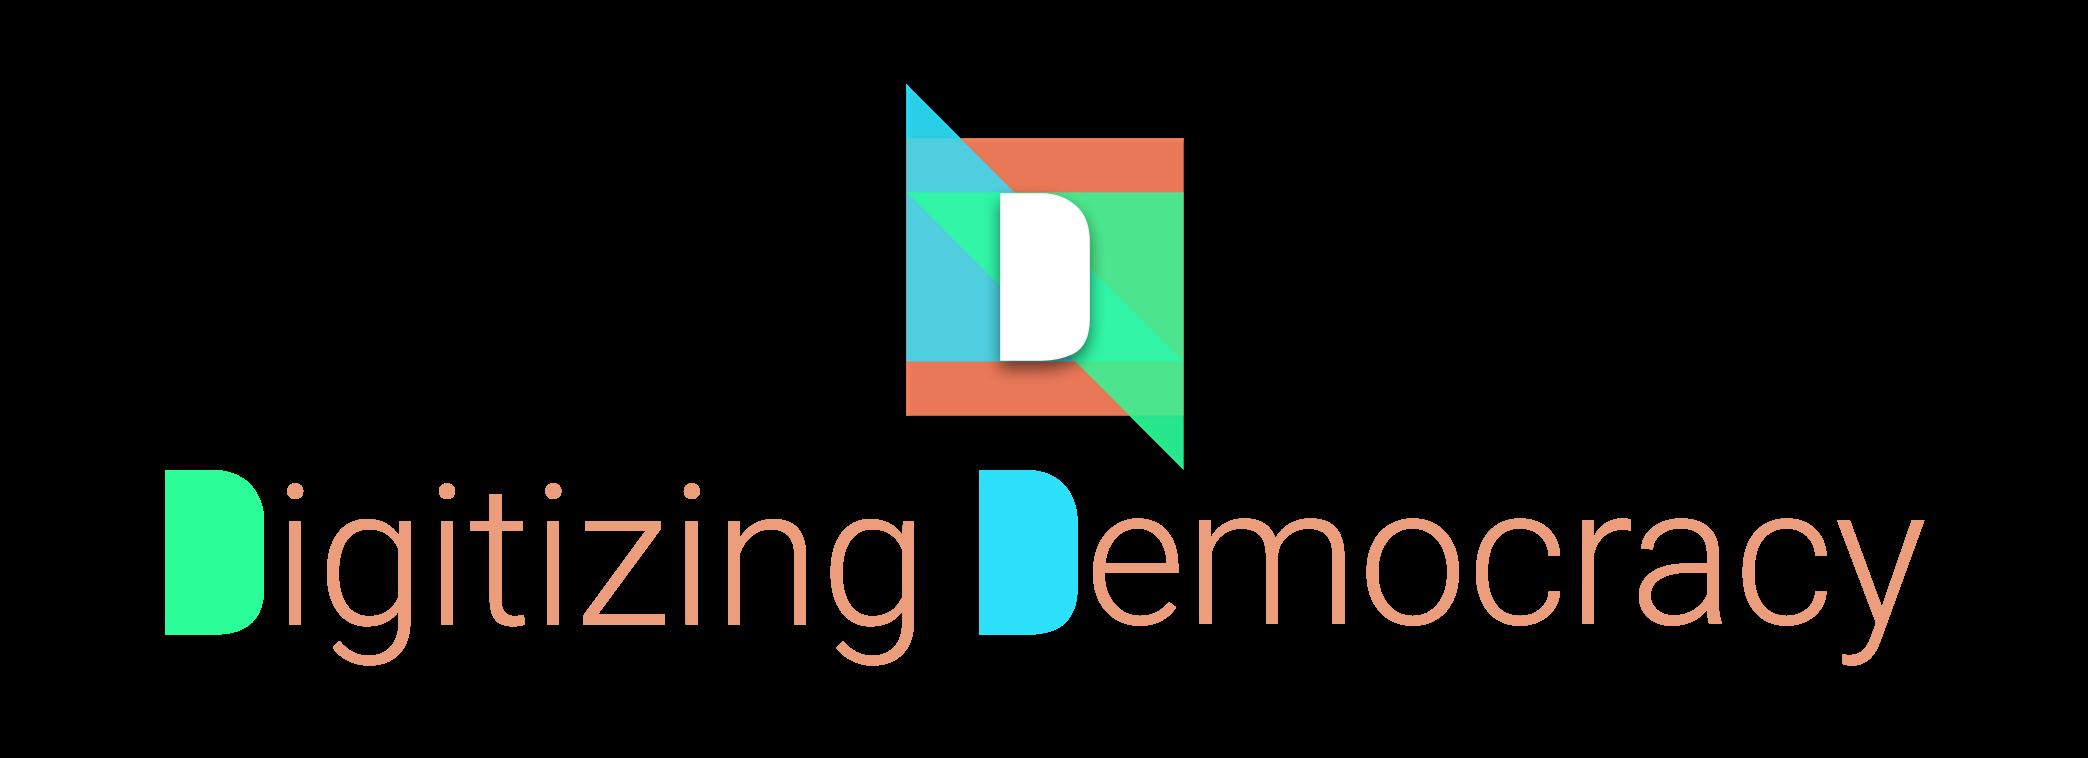 Digitizing Democracy Logo Copy 3.png